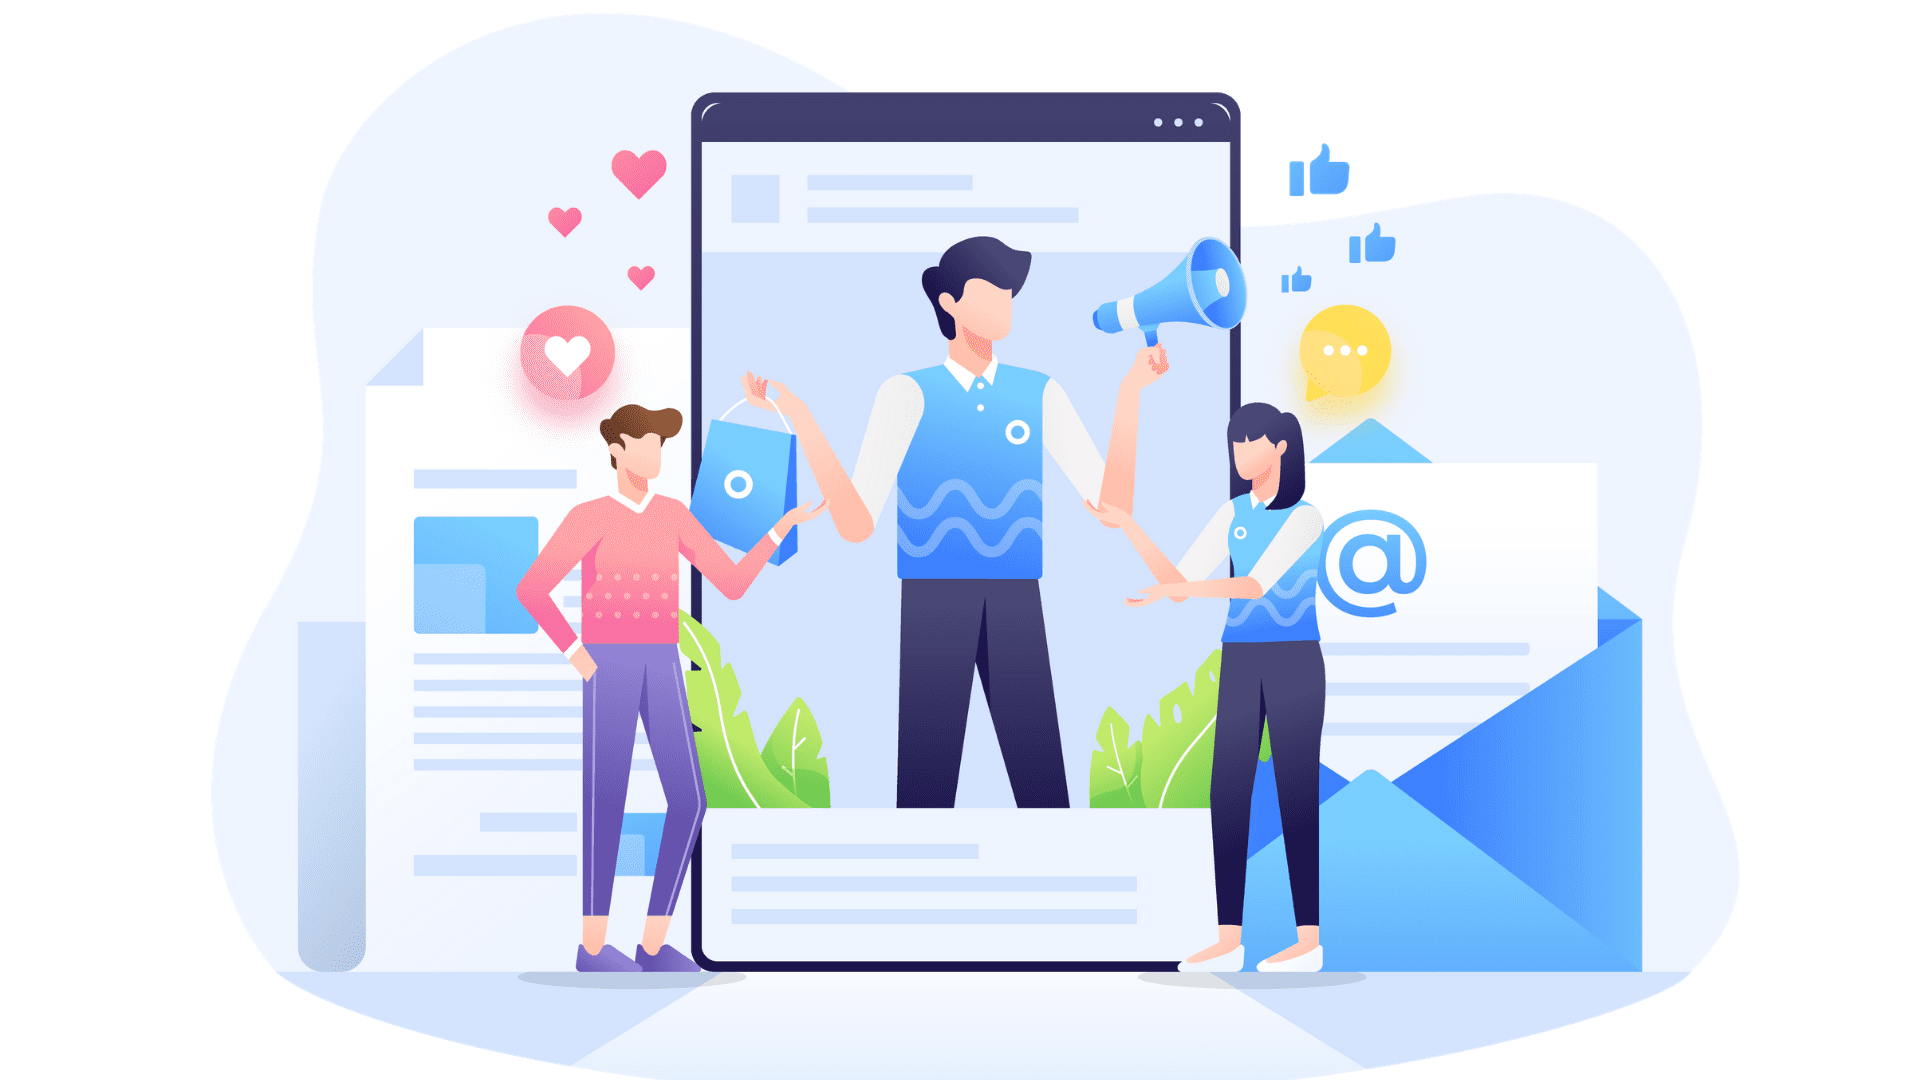 marketing ideas to promote app